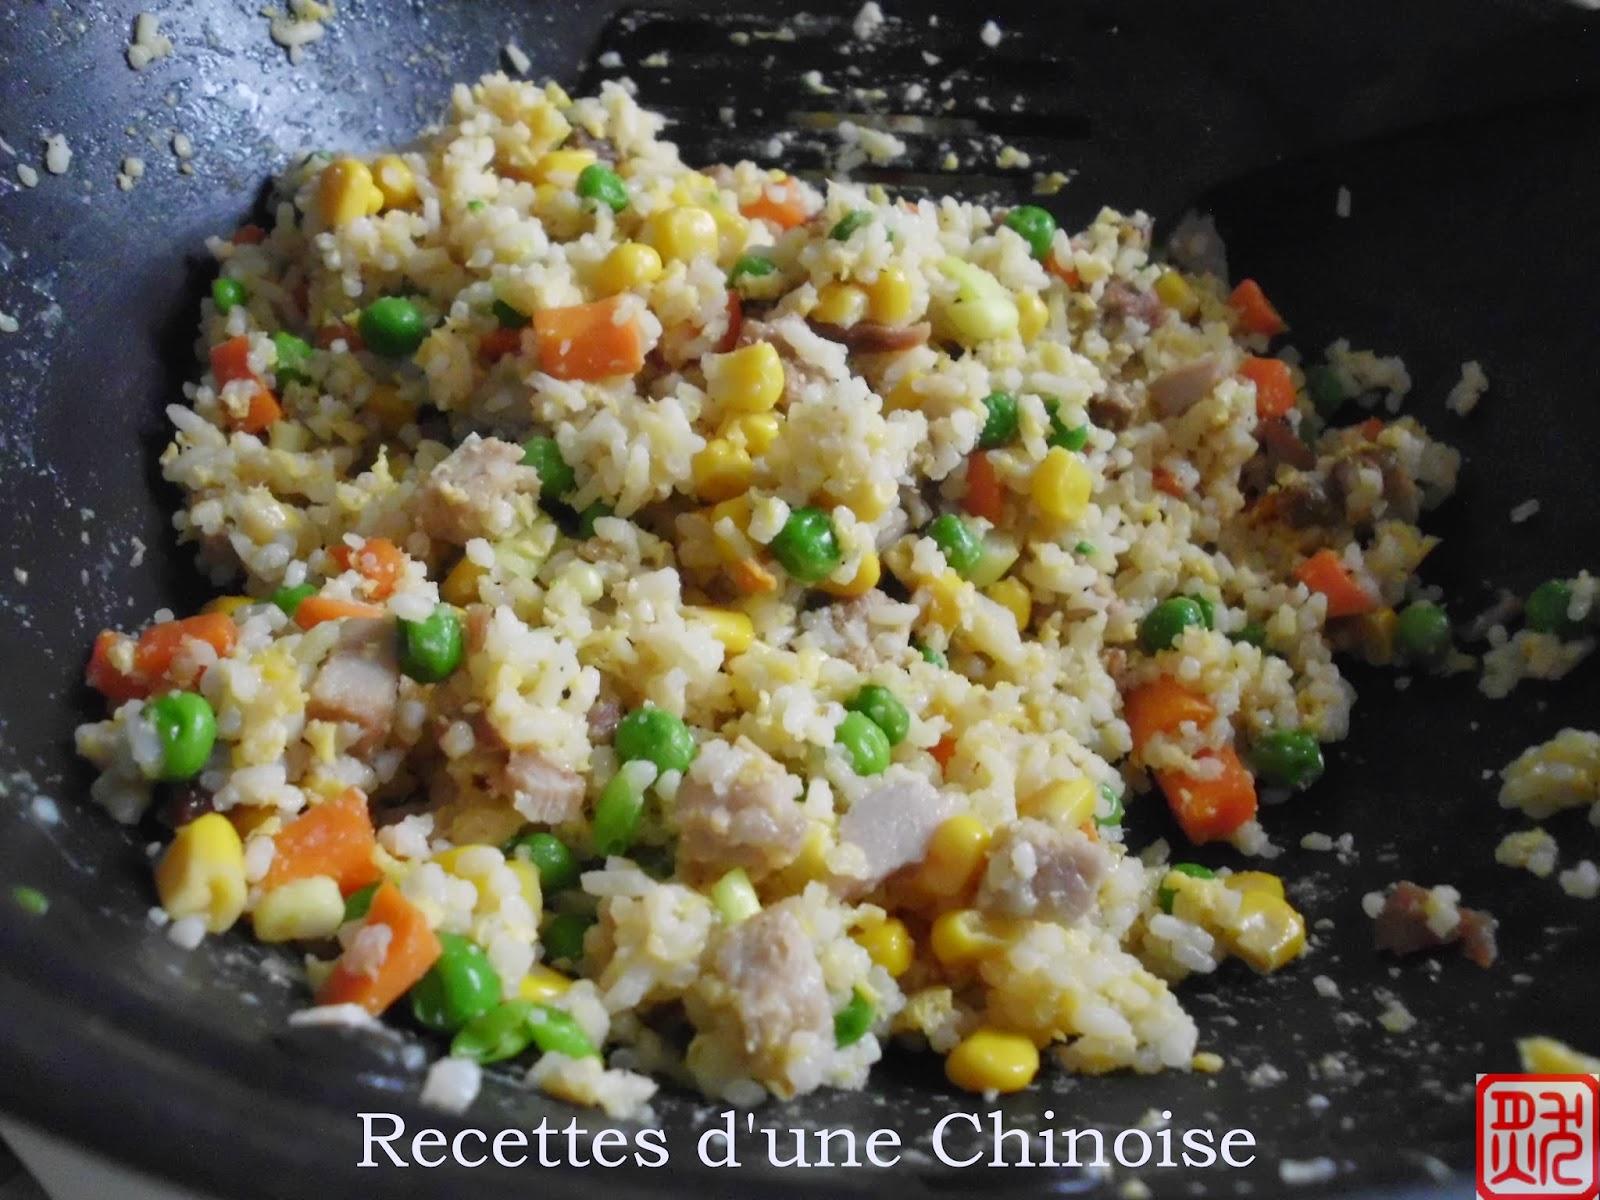 Le riz cantonais 广式炒饭 guǎngshì chǎofàn